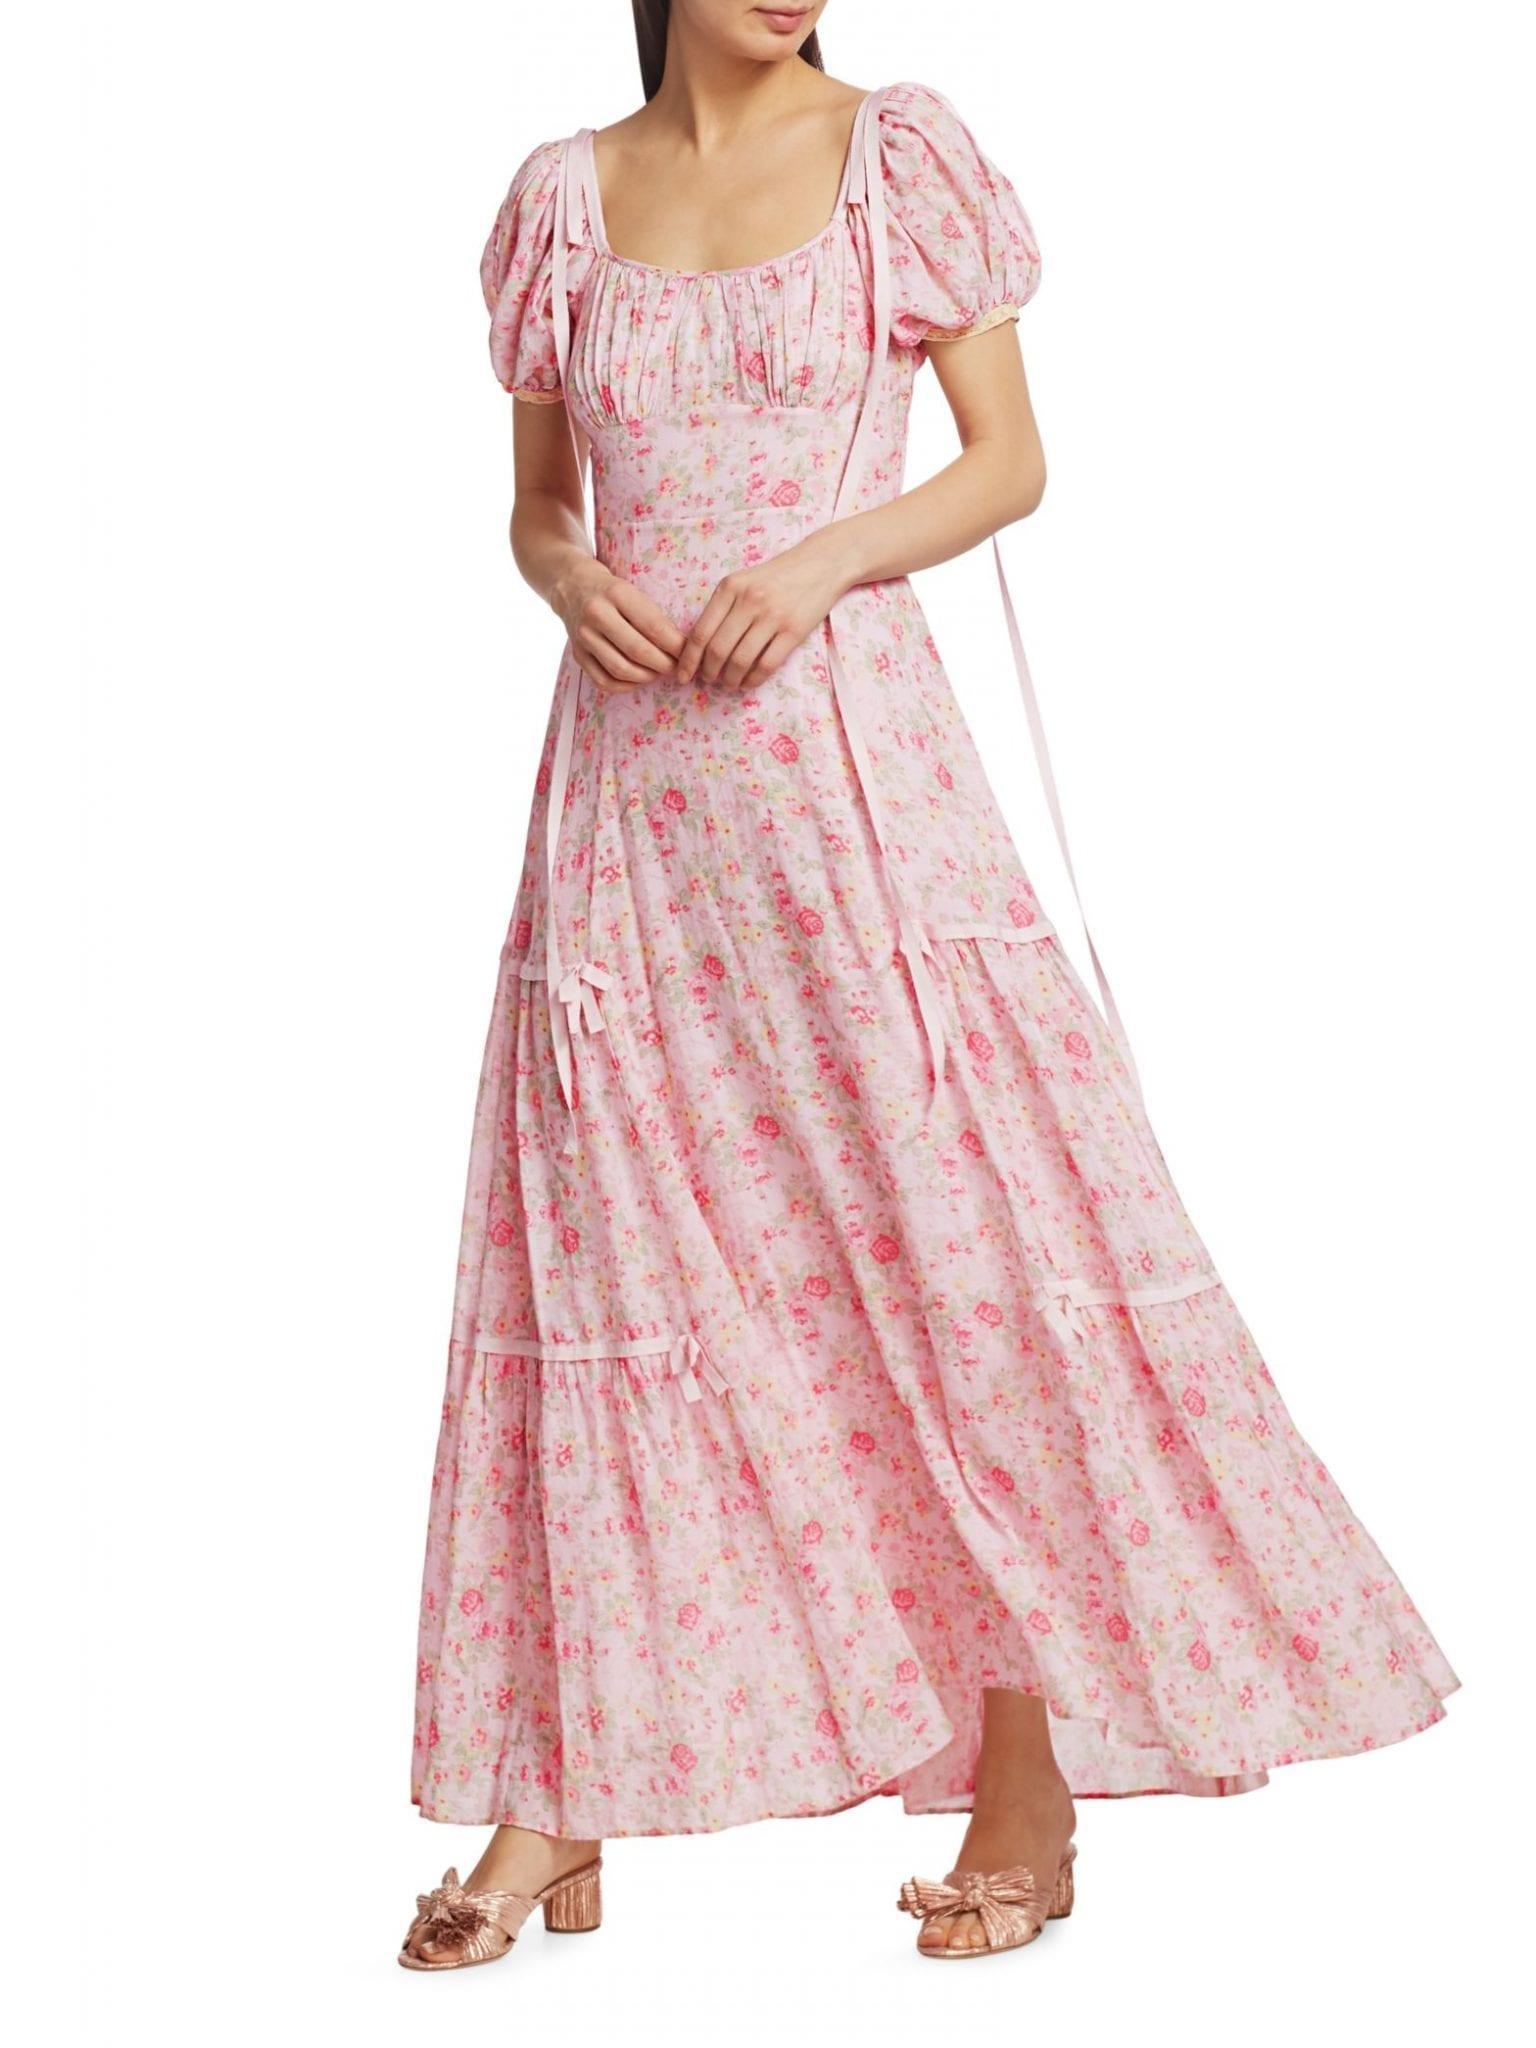 LE SUPERBE Major Flirt Metallic Stripe Floral Print Dress